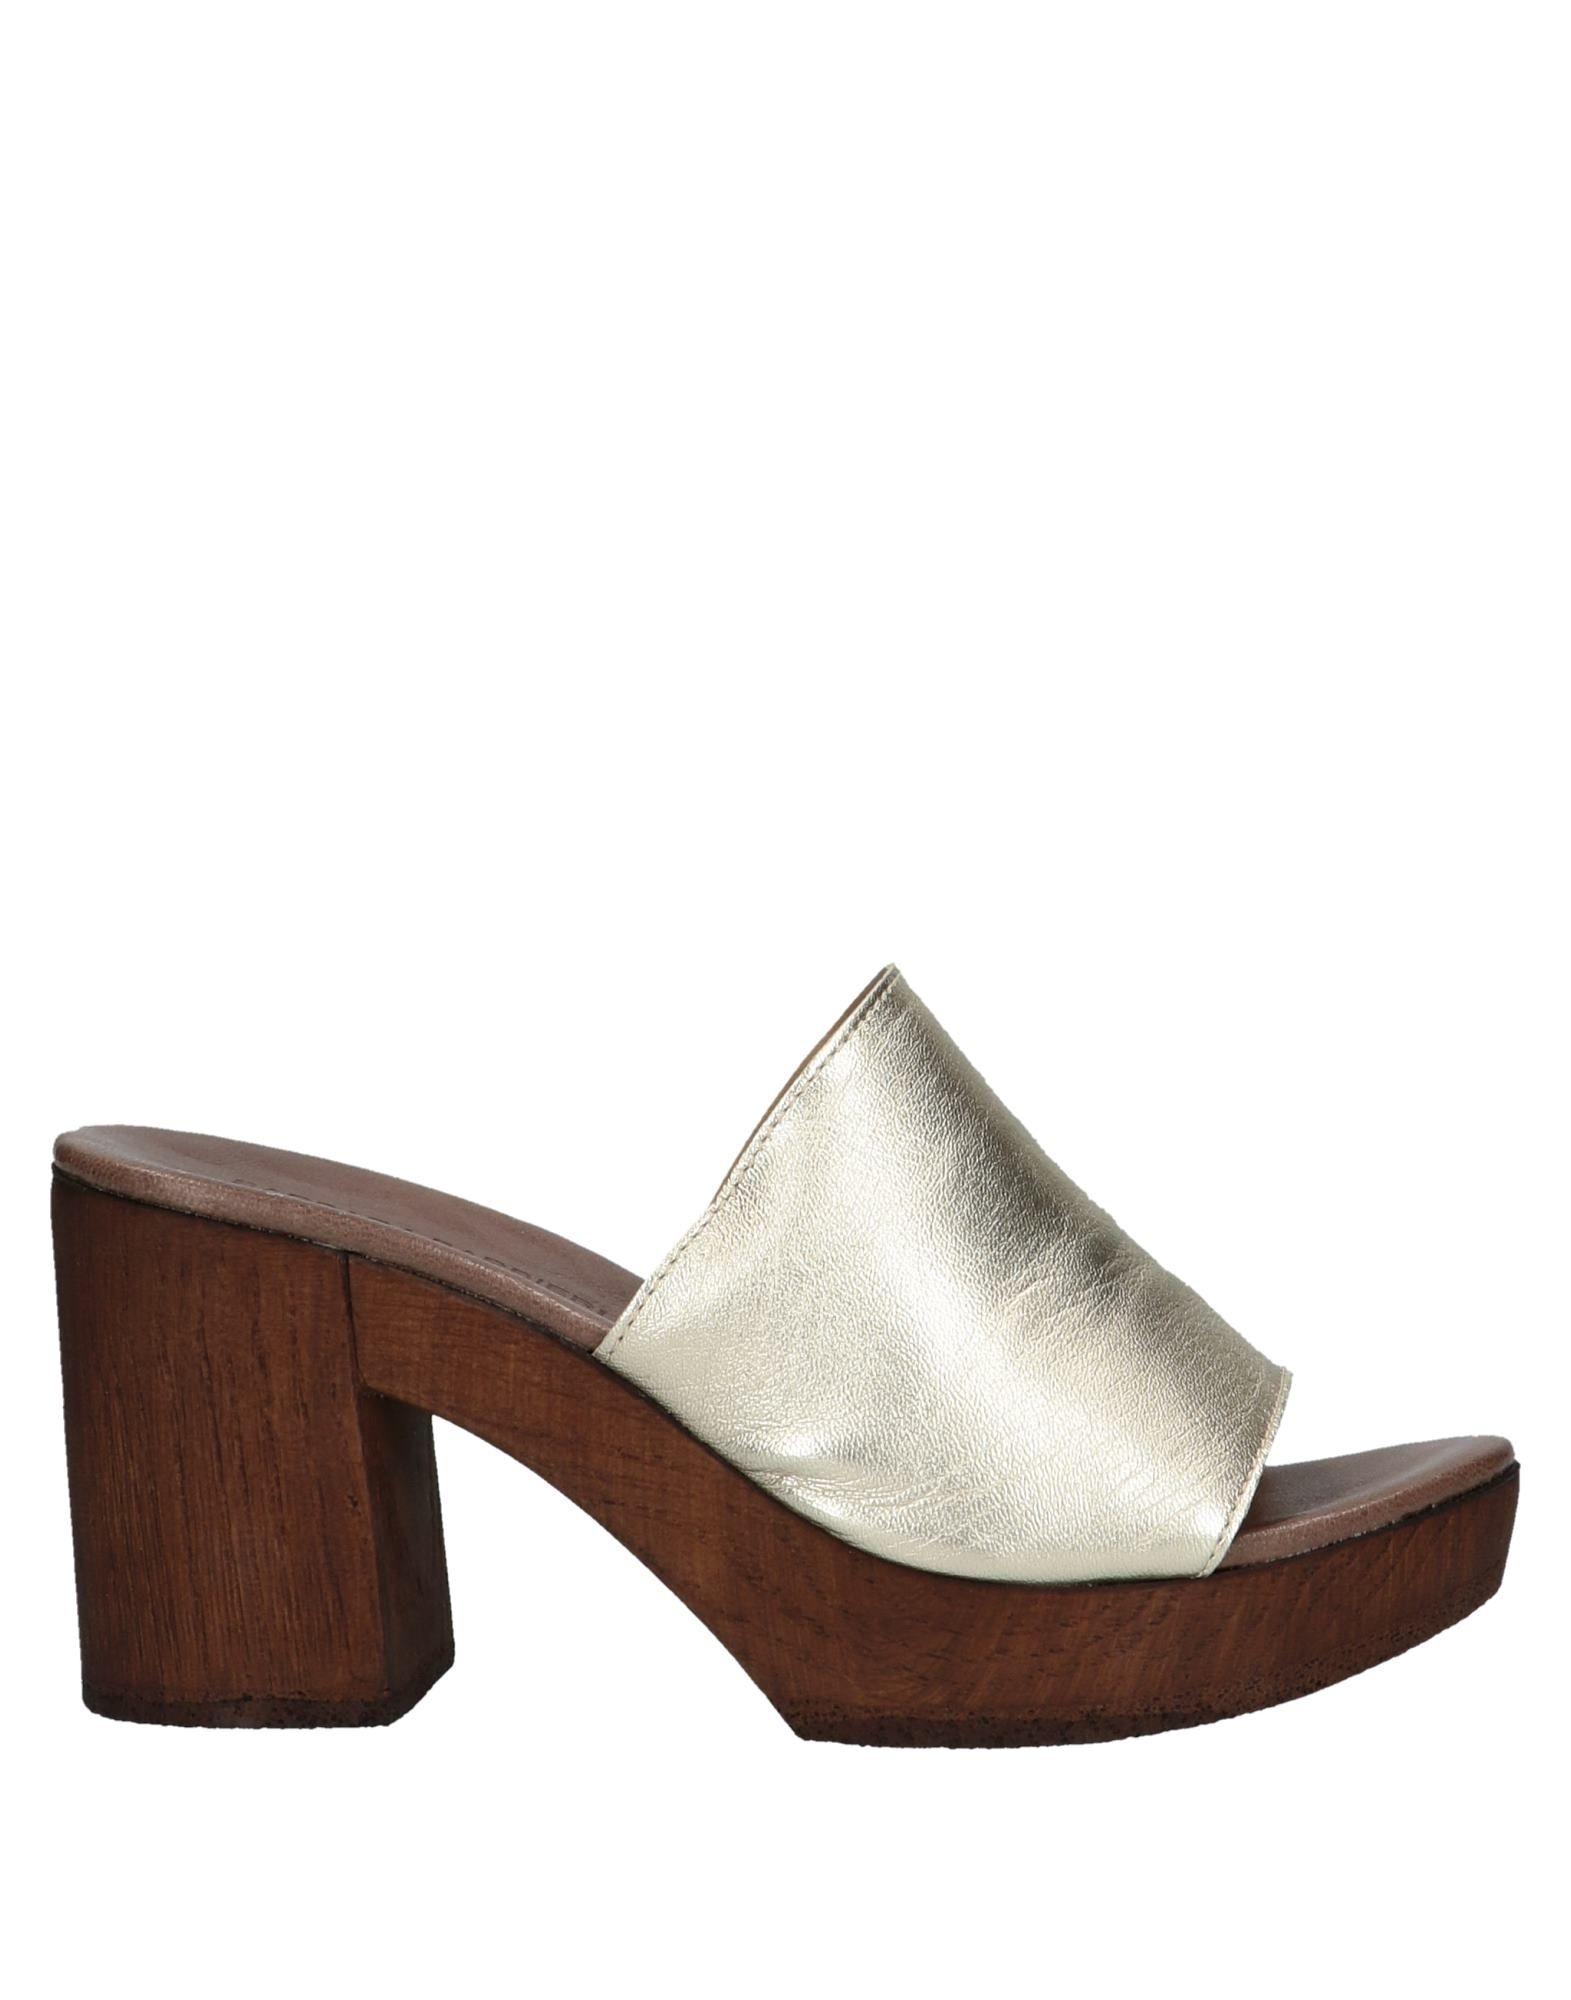 1f4ab8cee67eb Barbara Barbieri women s sandals  heeled